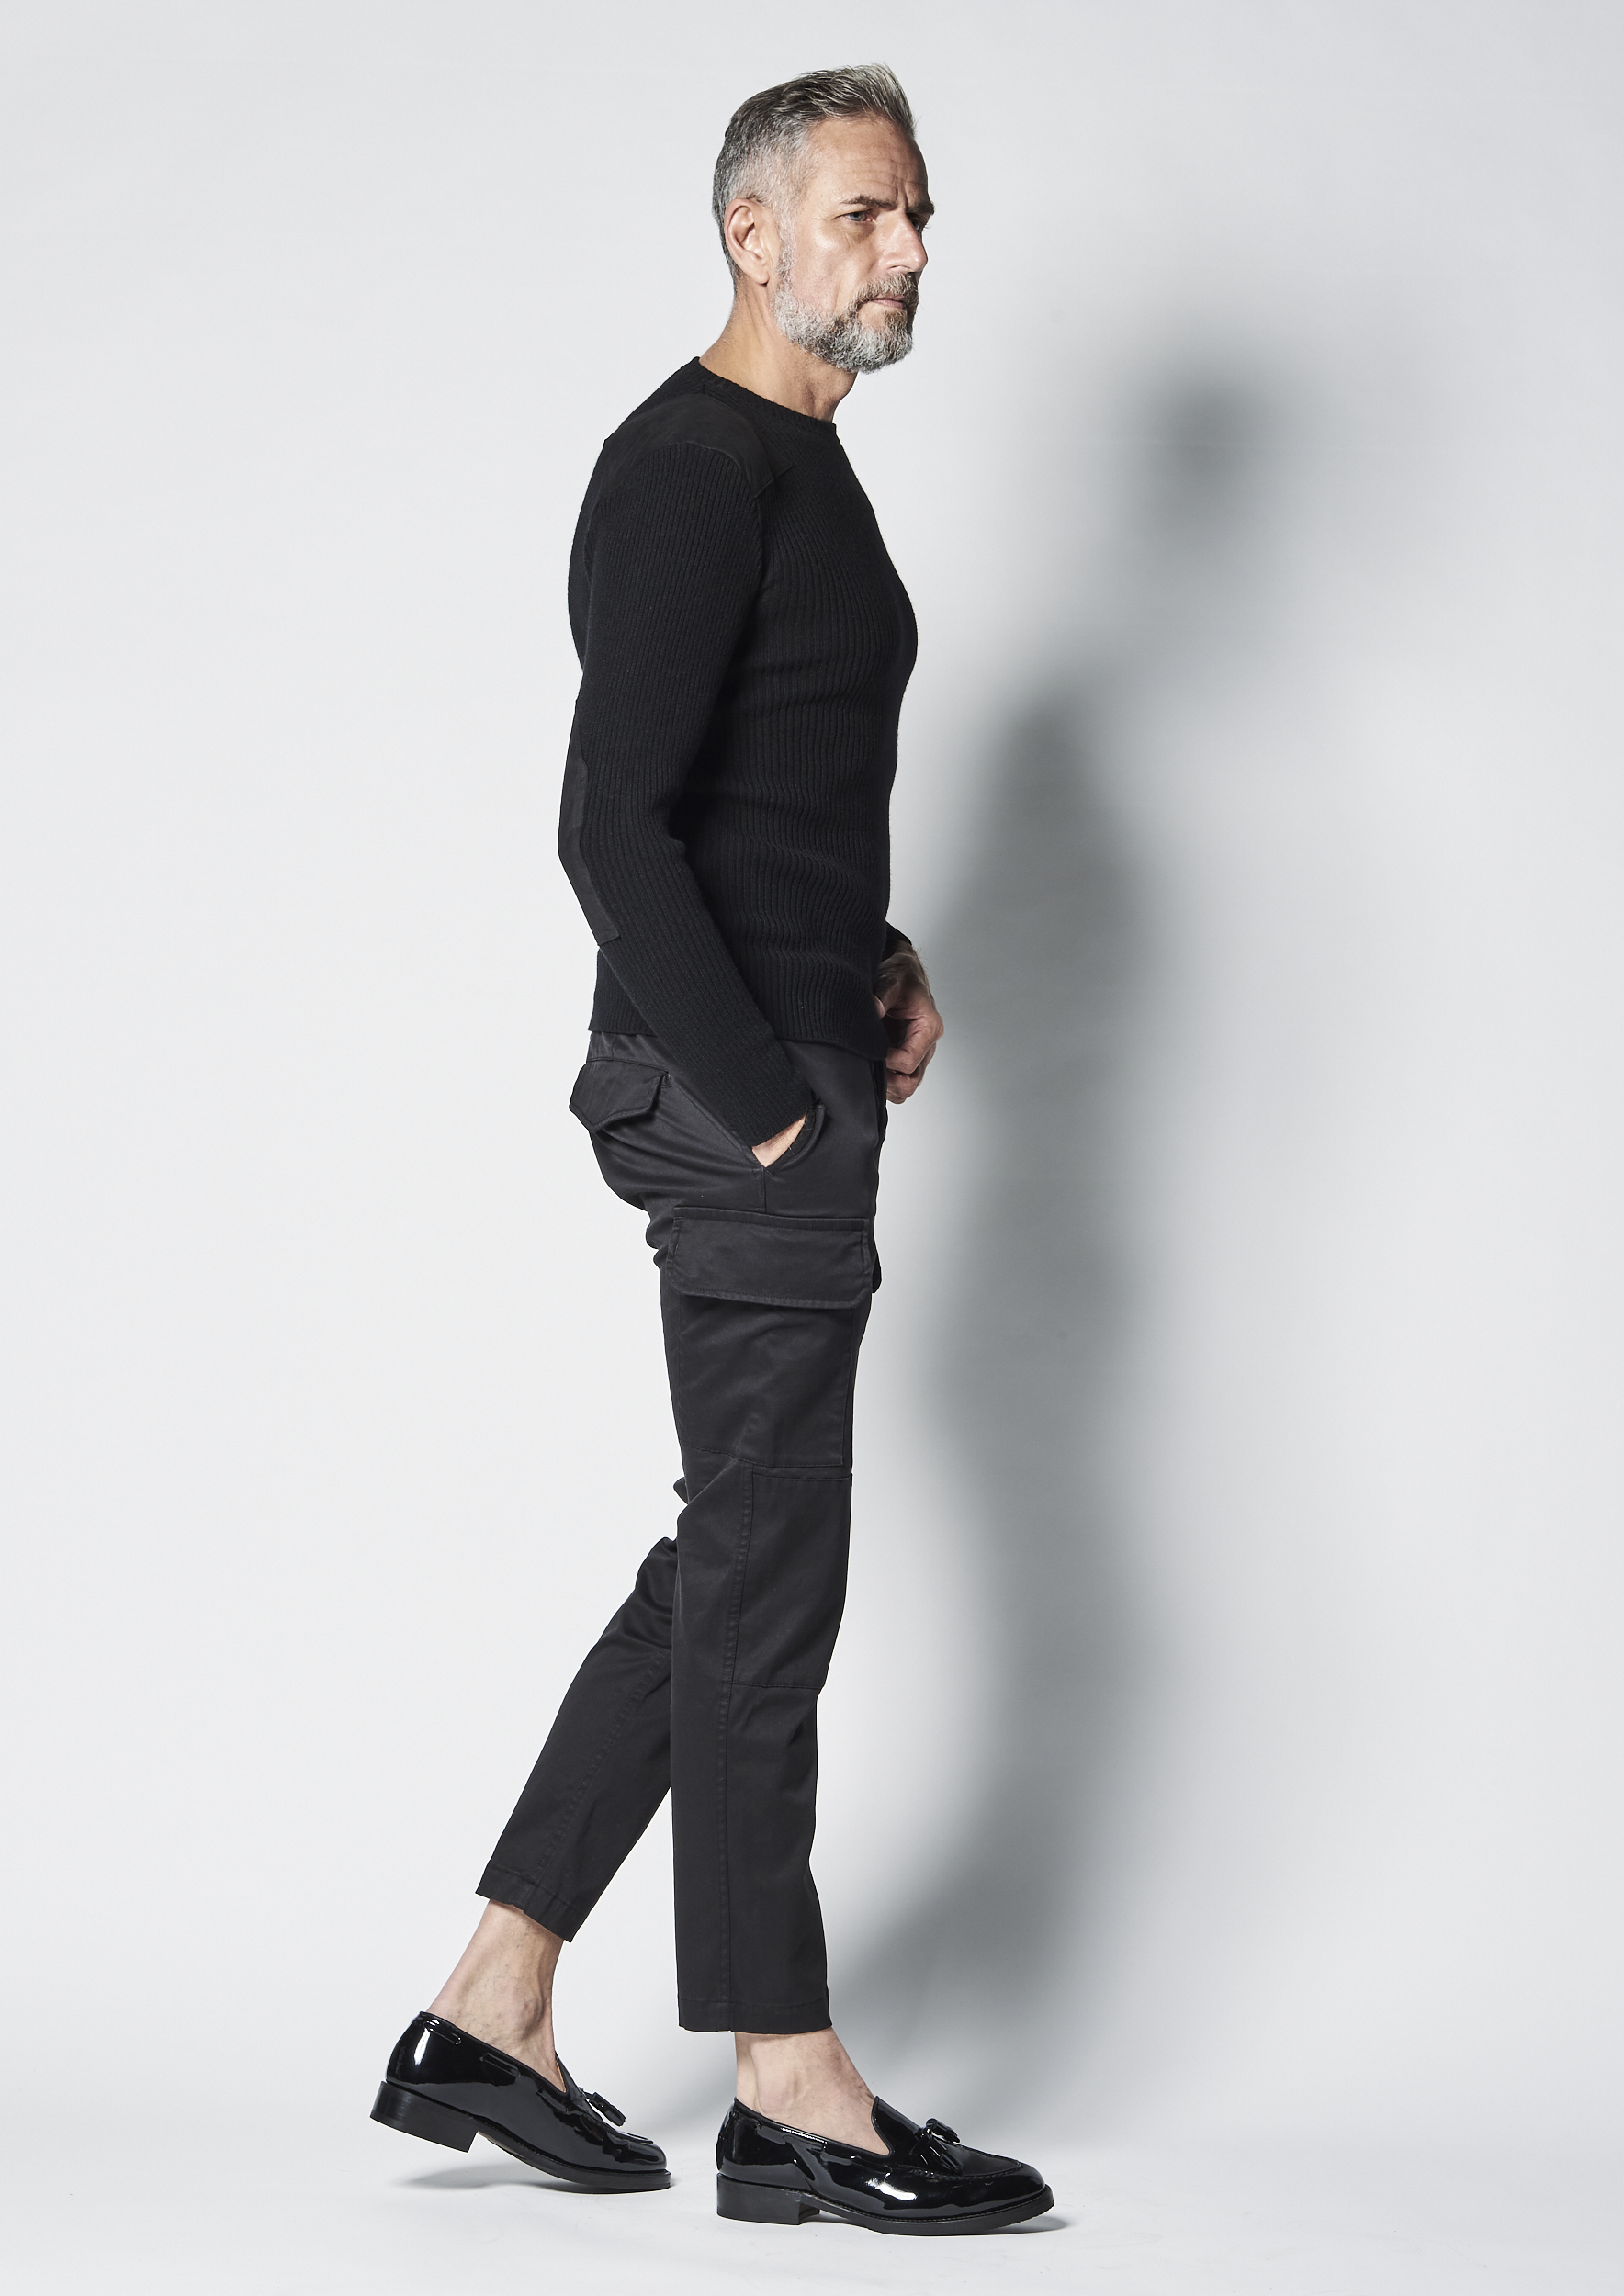 1PIU1UGUALE3 (ウノピュウノウグァーレトレ) BLACK MILITARY BY YOSHIMASA HOSHIBA (ブラックミリタリー バイ 干場義雅) COMMAND KNIT (コマンドニット) CASHMERE カシミアセーター BLACK (ブラック) MADE IN JAPAN (日本製) 2021  愛知 名古屋 Alto e Diritto altoediritto アルトエデリット 干場義雅 hoshiba yoshimasa